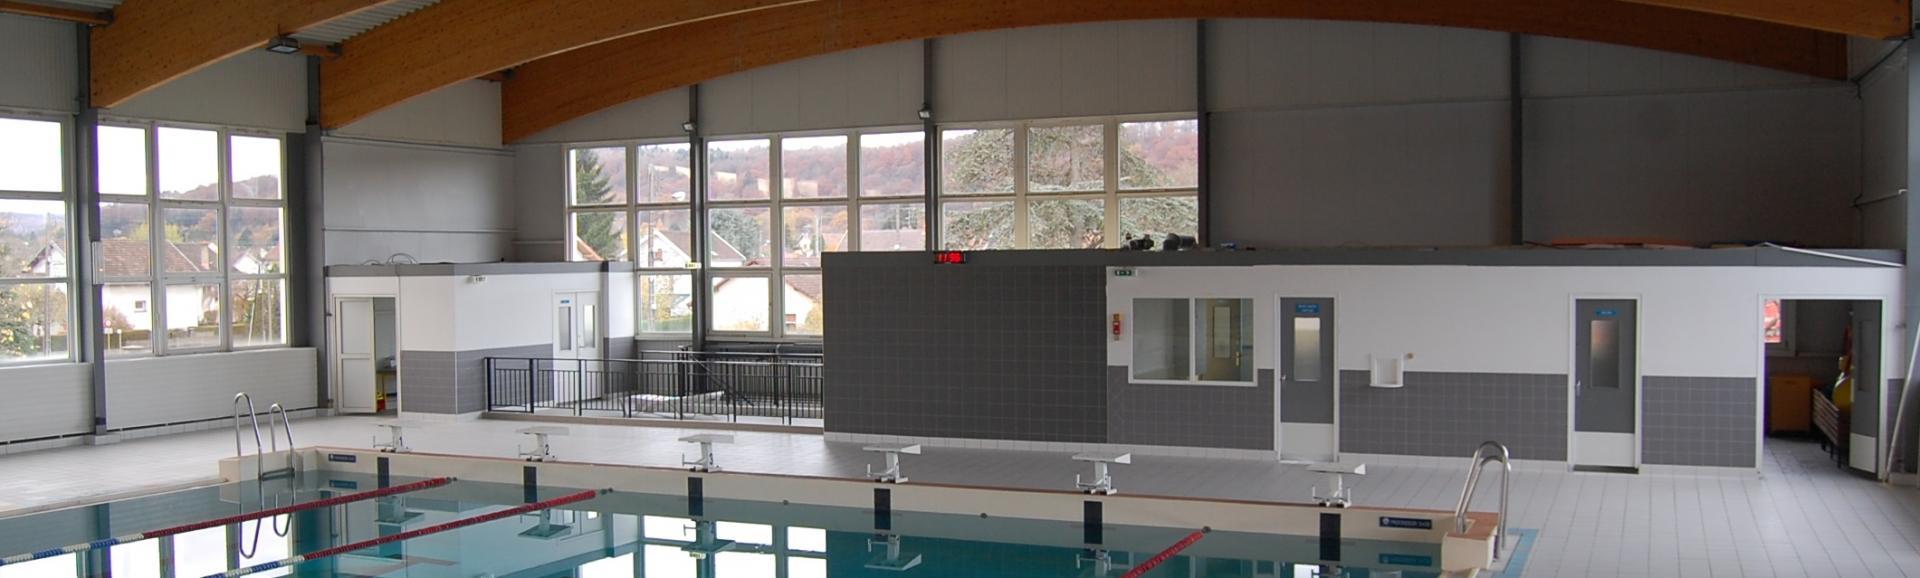 Swim Val. Loisirs-Reductions.fr encequiconcerne Piscine Valentigney